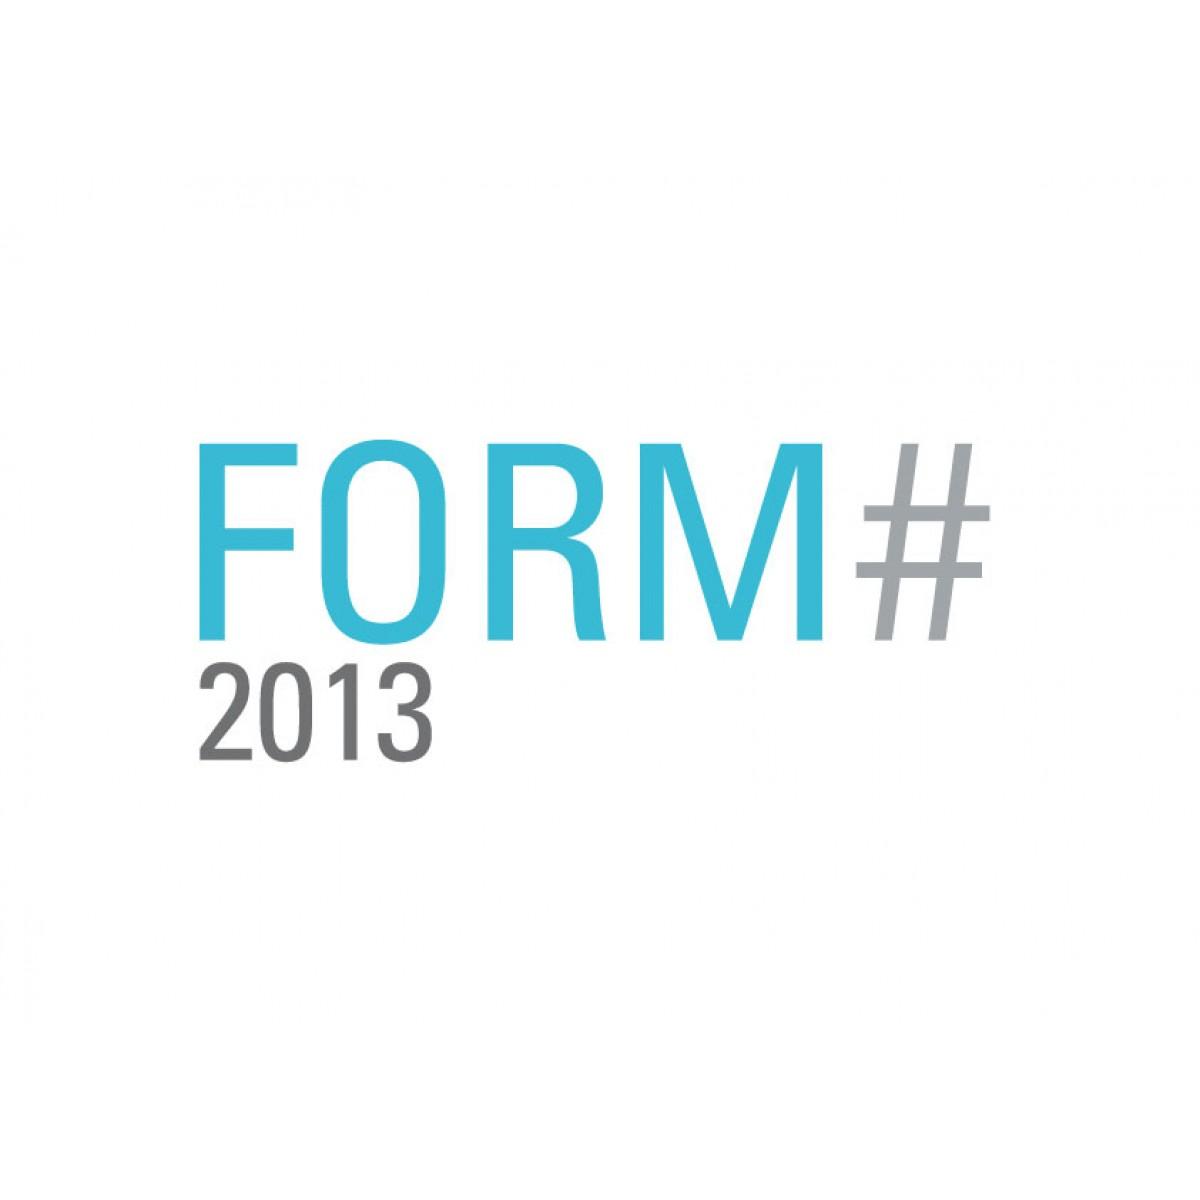 QR-Code Memo-Spiel & Postkartenset - FORM#2013